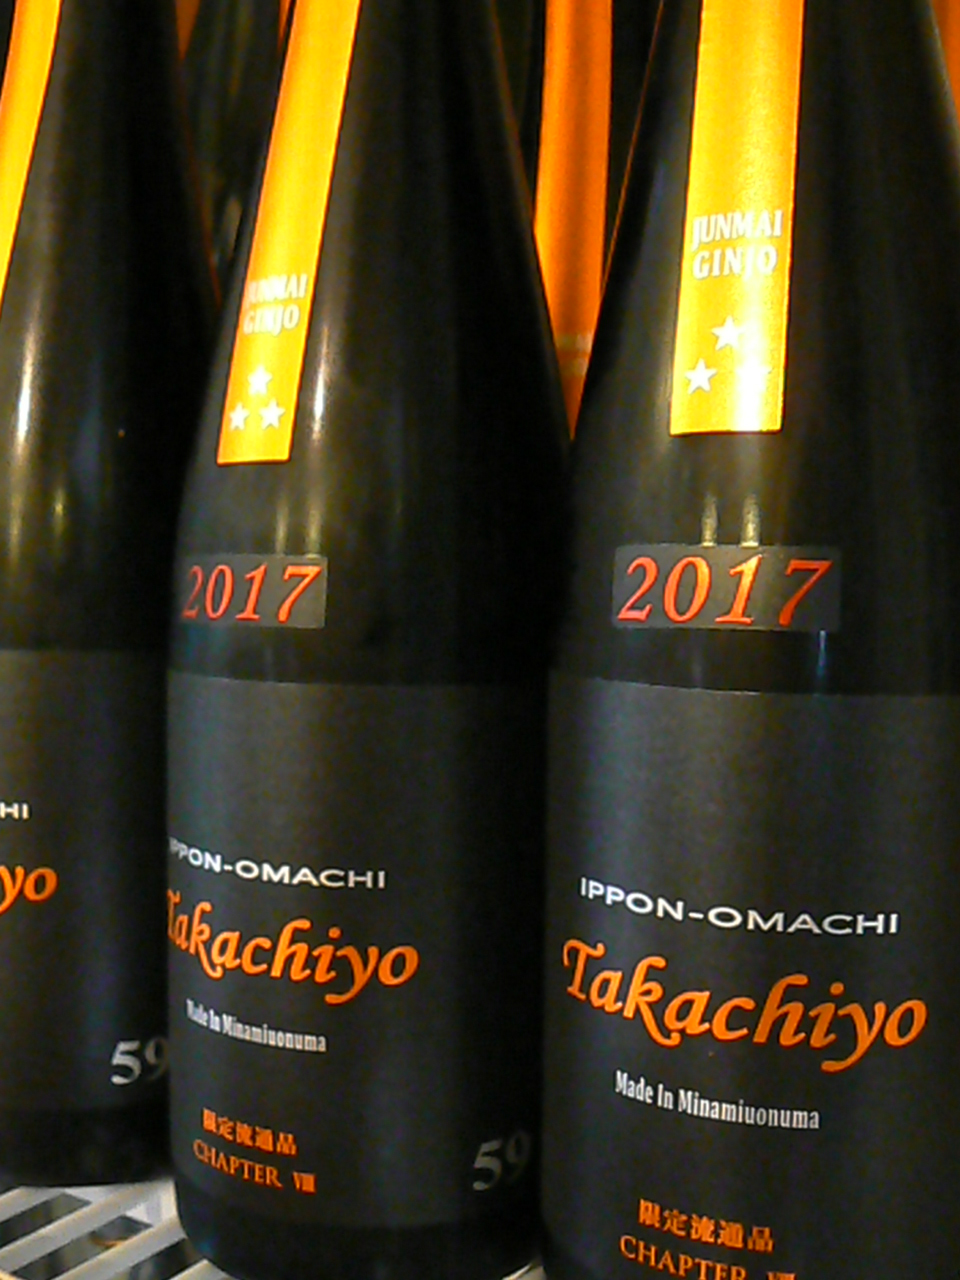 2017.7.Takachiyoオレンジ (1)